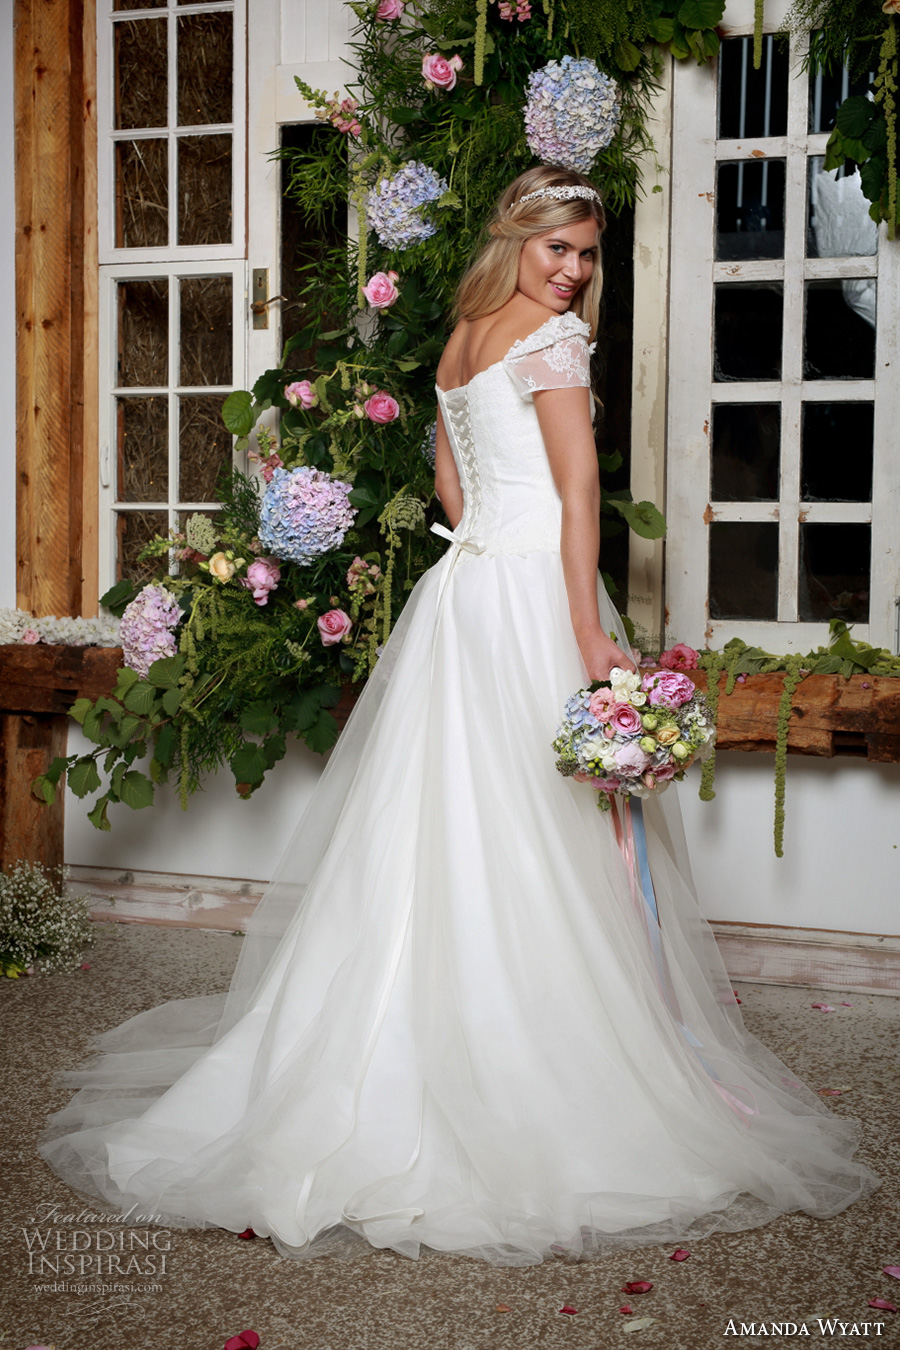 Corset Short Wedding Dress 17 Superb amanda wyatt bridal short